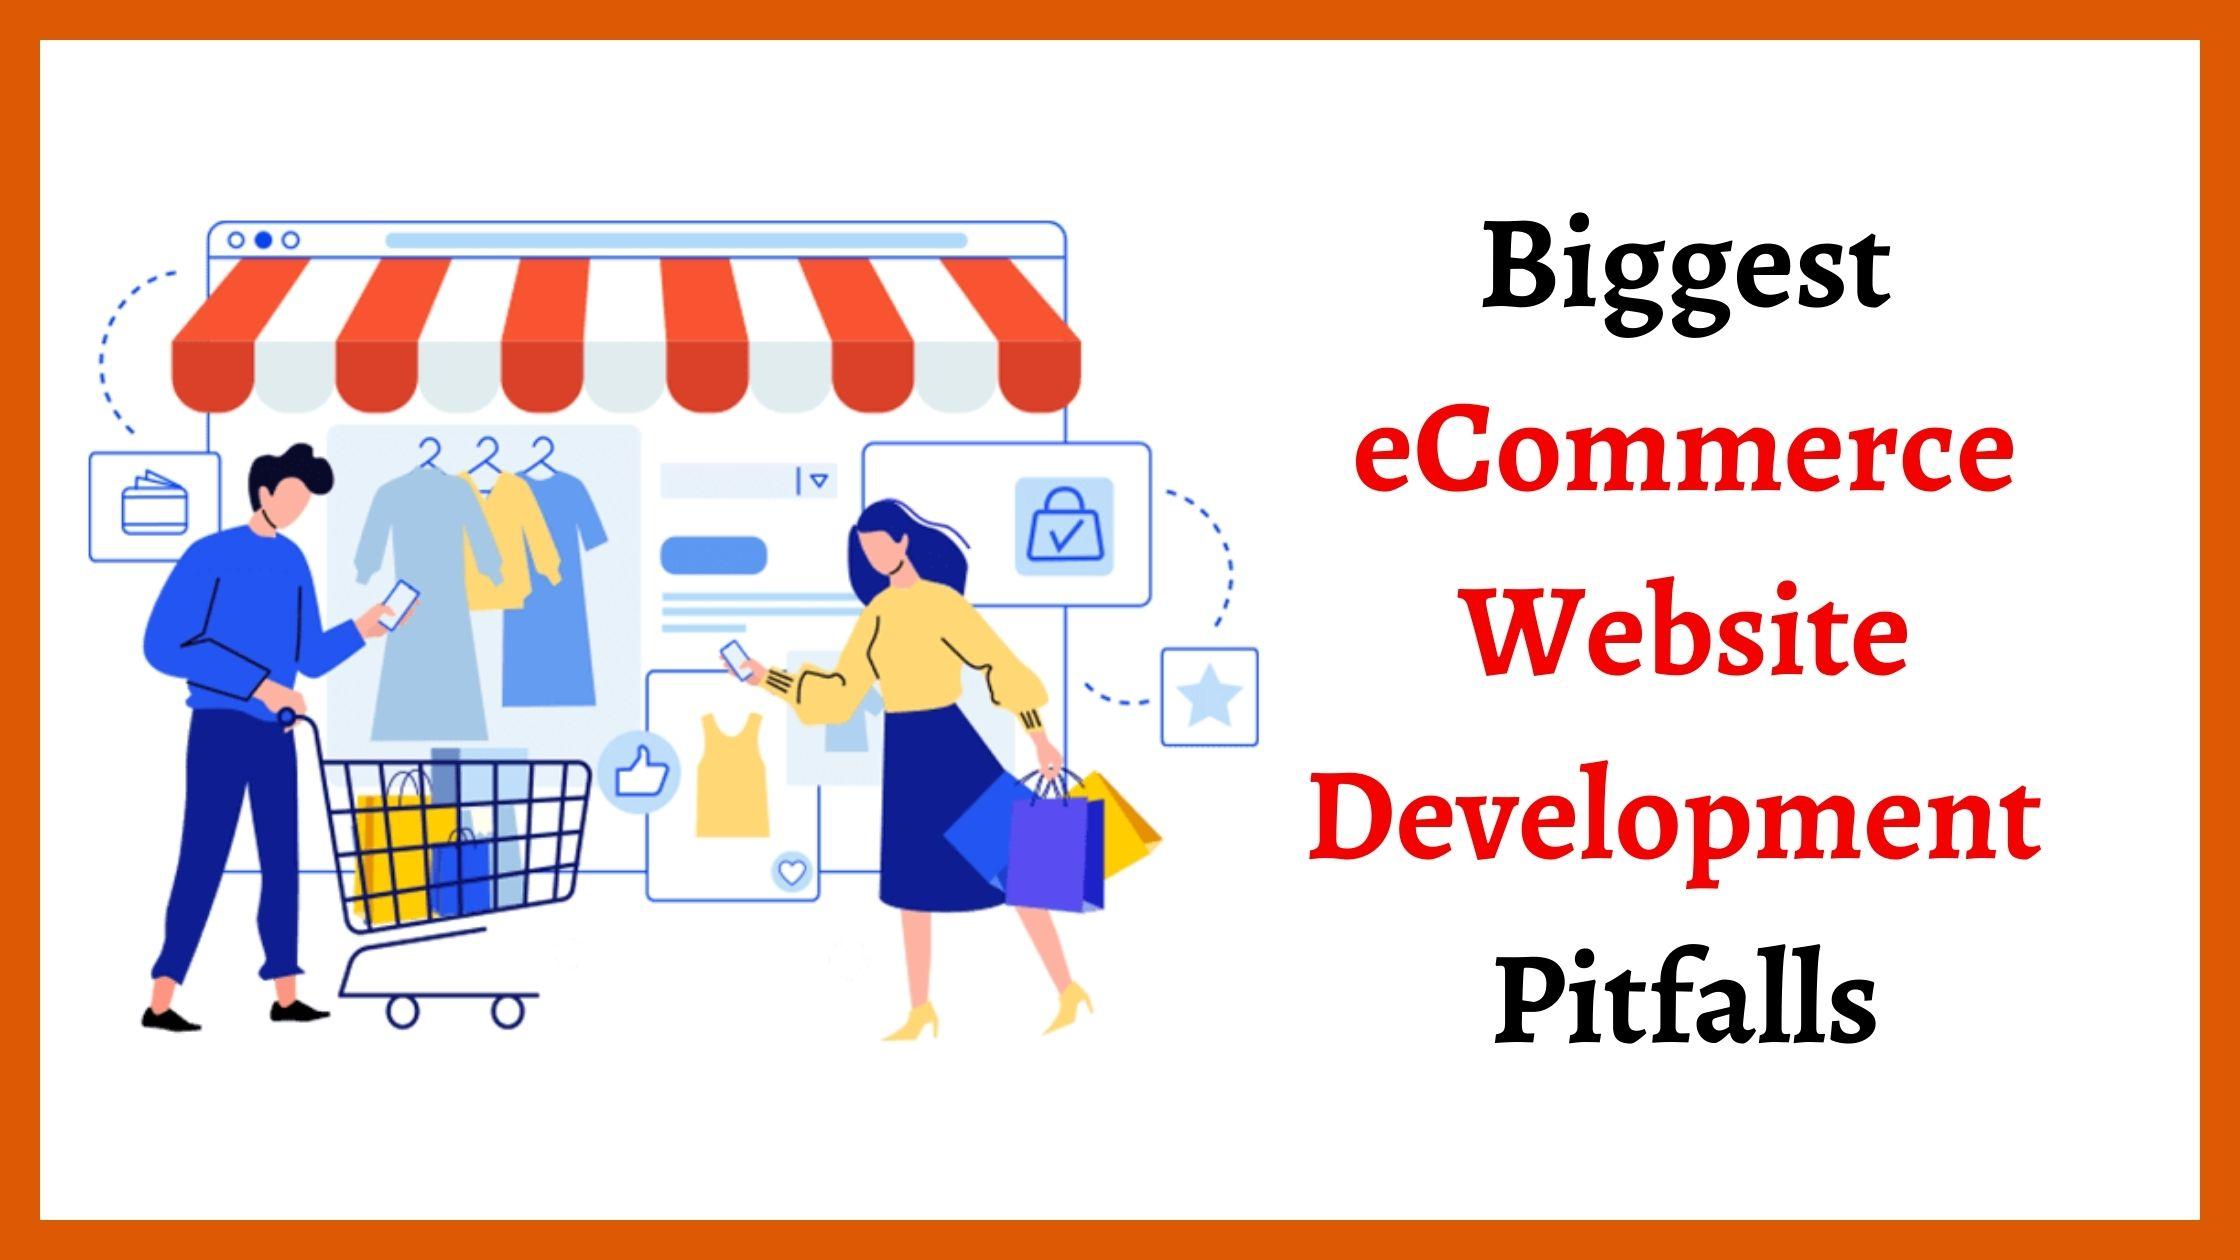 Biggest eCommerce Website Development _Pitfalls